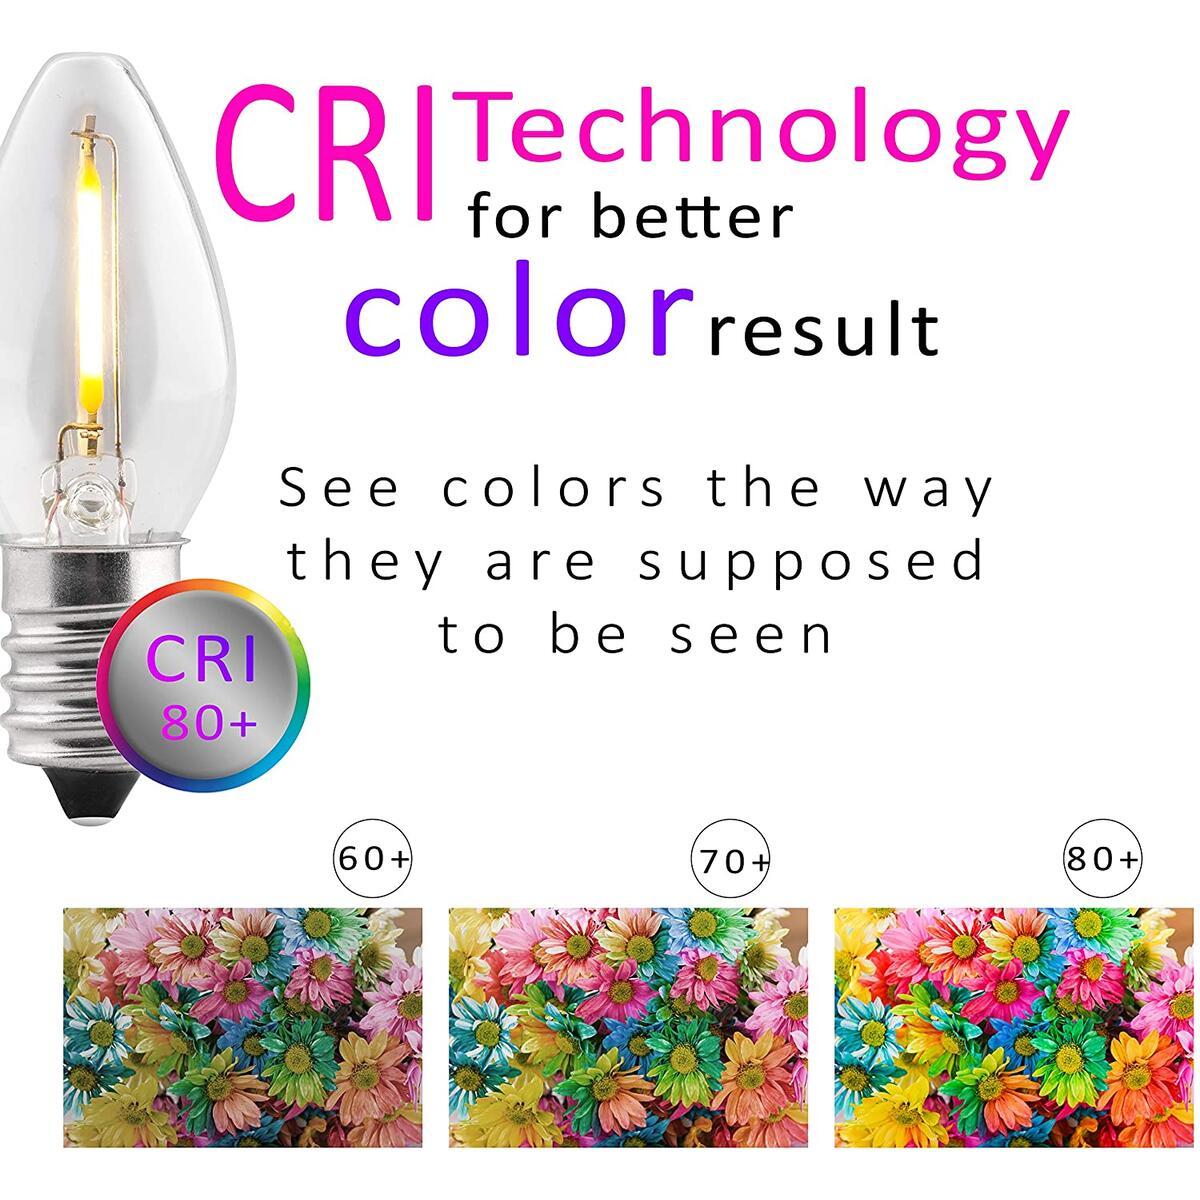 LED Night Light Bulb – C7 E12 LED Bulbs – Candelabra Light Bulbs, 1 Watt Equivalent 10W Incandescent Bulb, Warm White 2700K, Lead Free Base, Window Candles & Chandeliers Replacement Bulb, 4 Pack